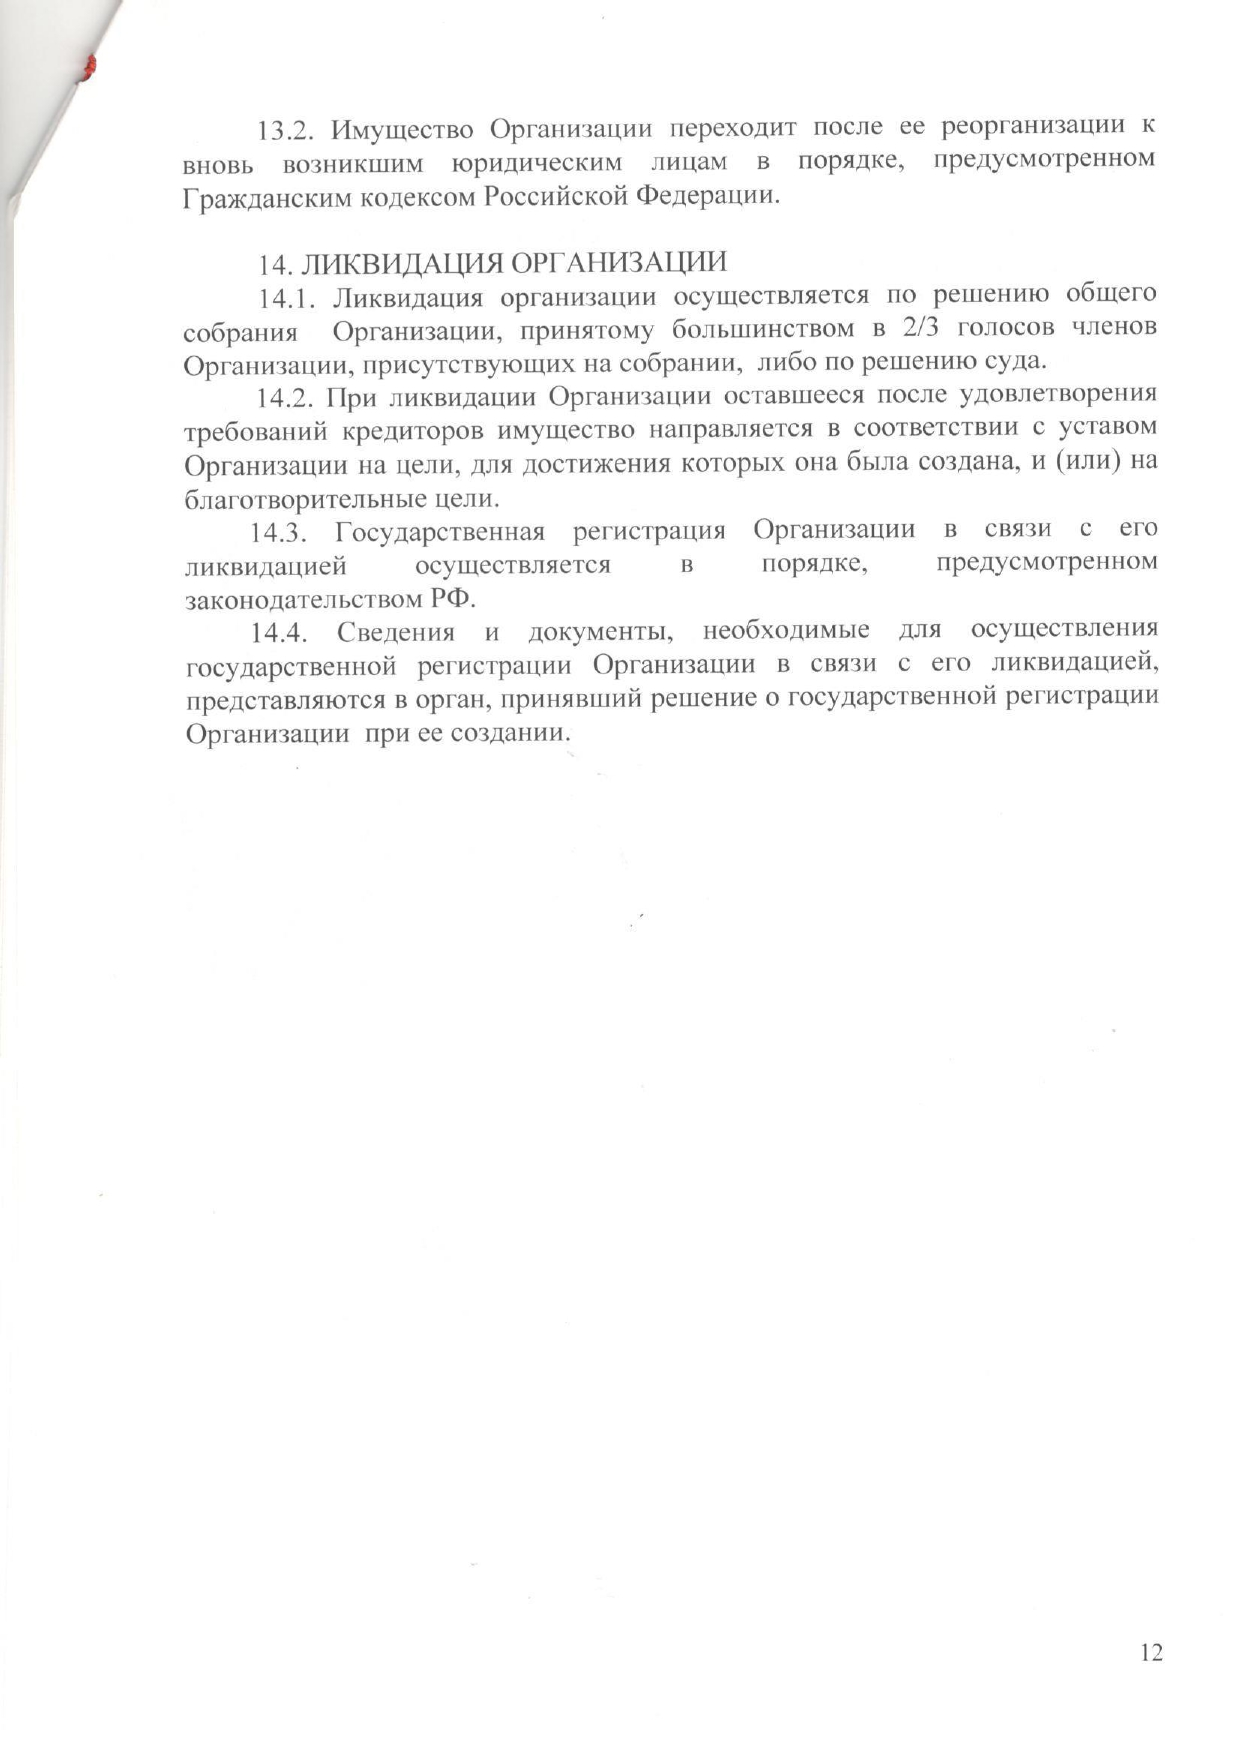 Устав_pages-to-jpg-0012